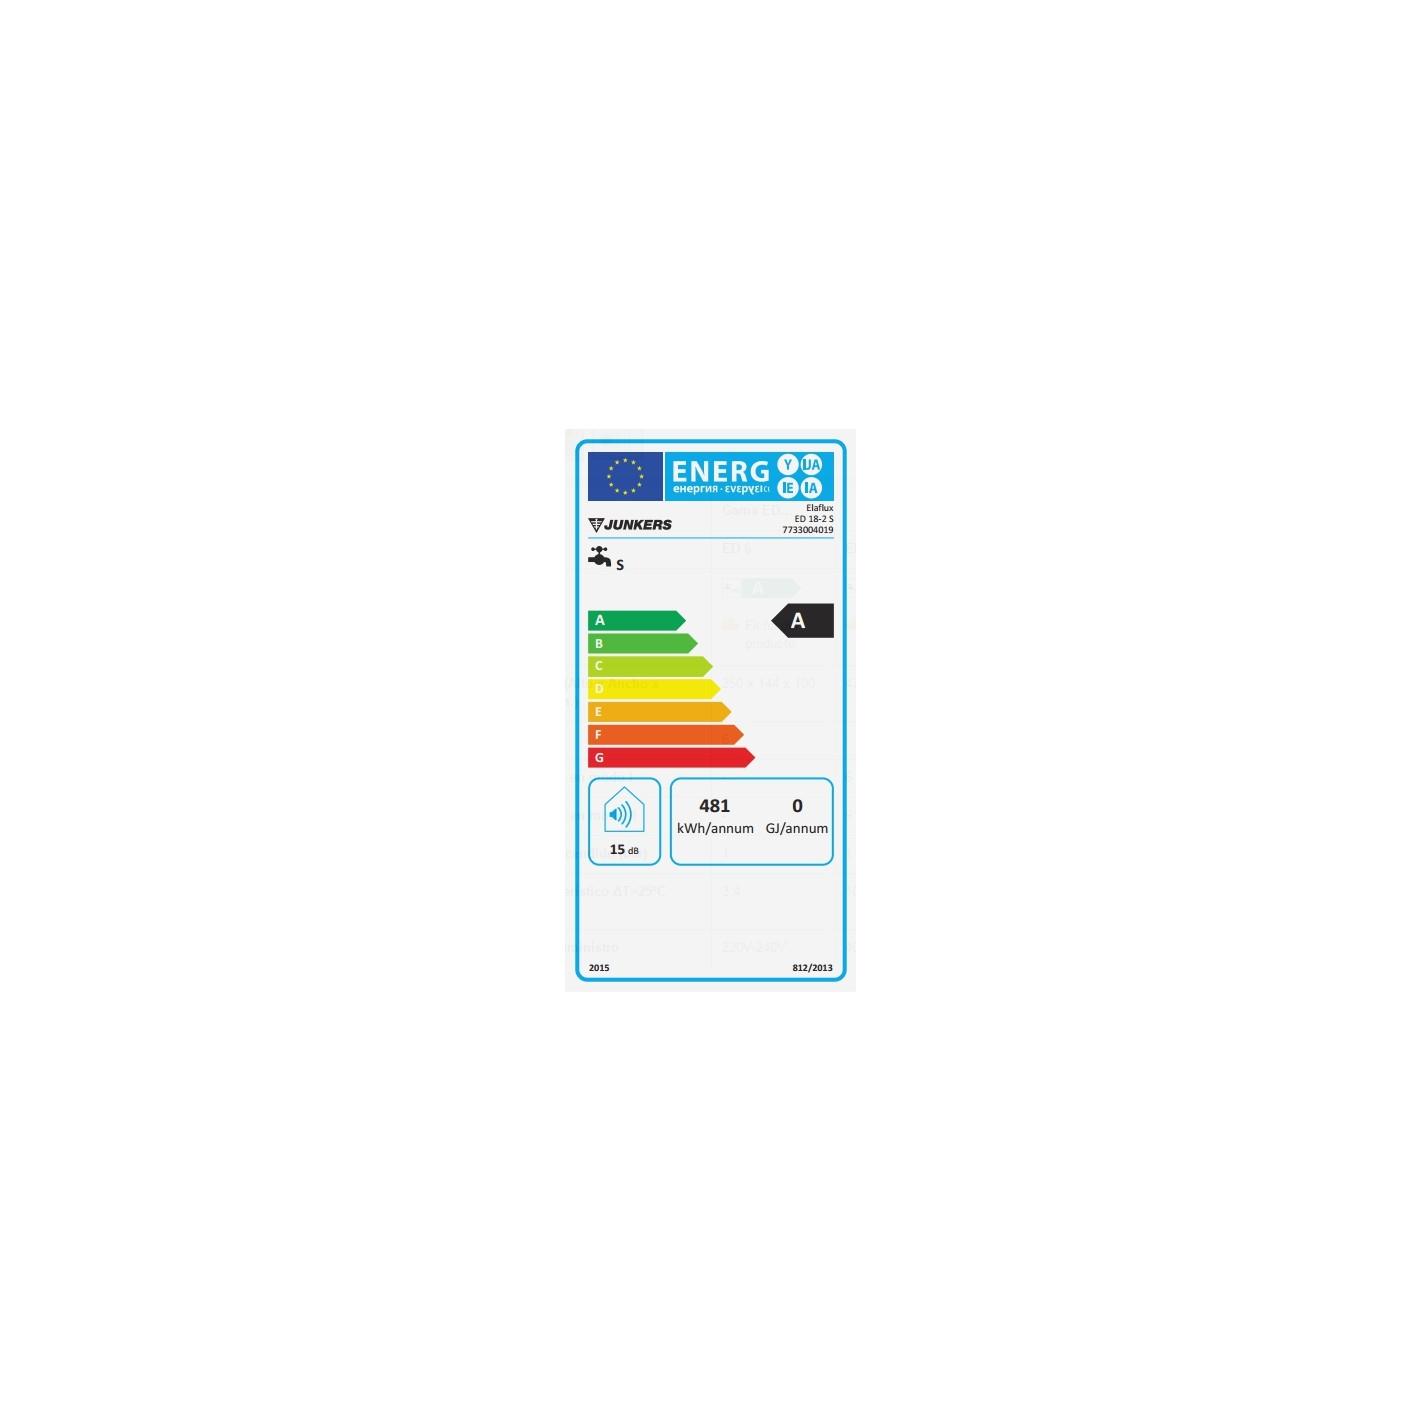 Calentador el ctrico instant neo junkers ed 18 2s precio - Calentador electrico precio ...